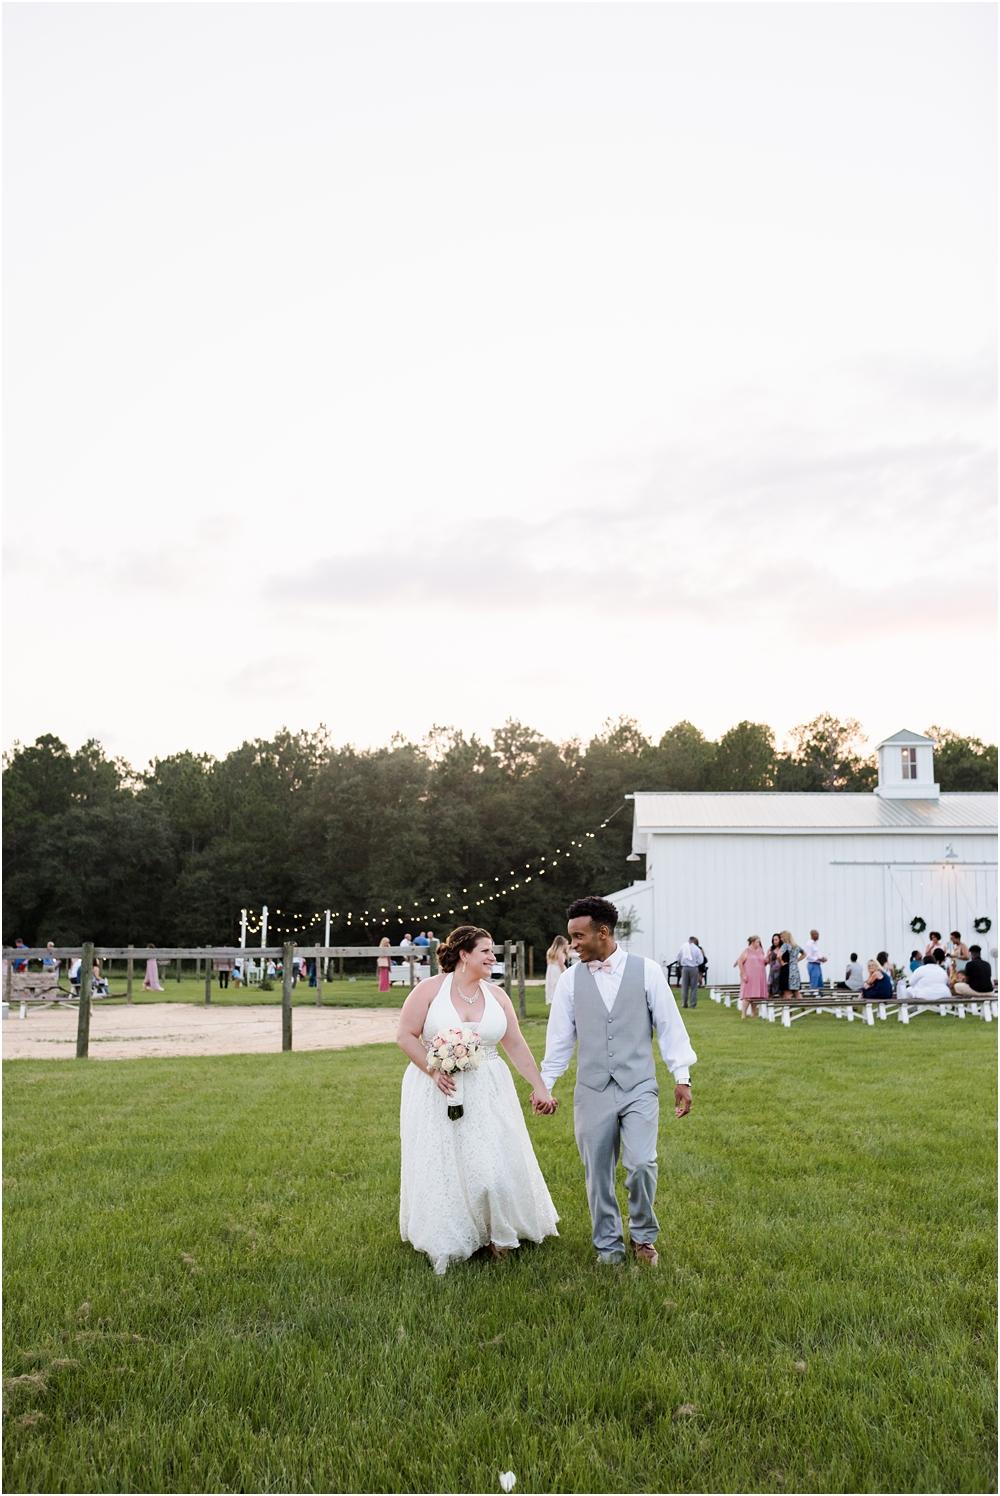 mosley-wedding-kiersten-stevenson-photography-30a-panama-city-beach-dothan-tallahassee-(321-of-472).JPG